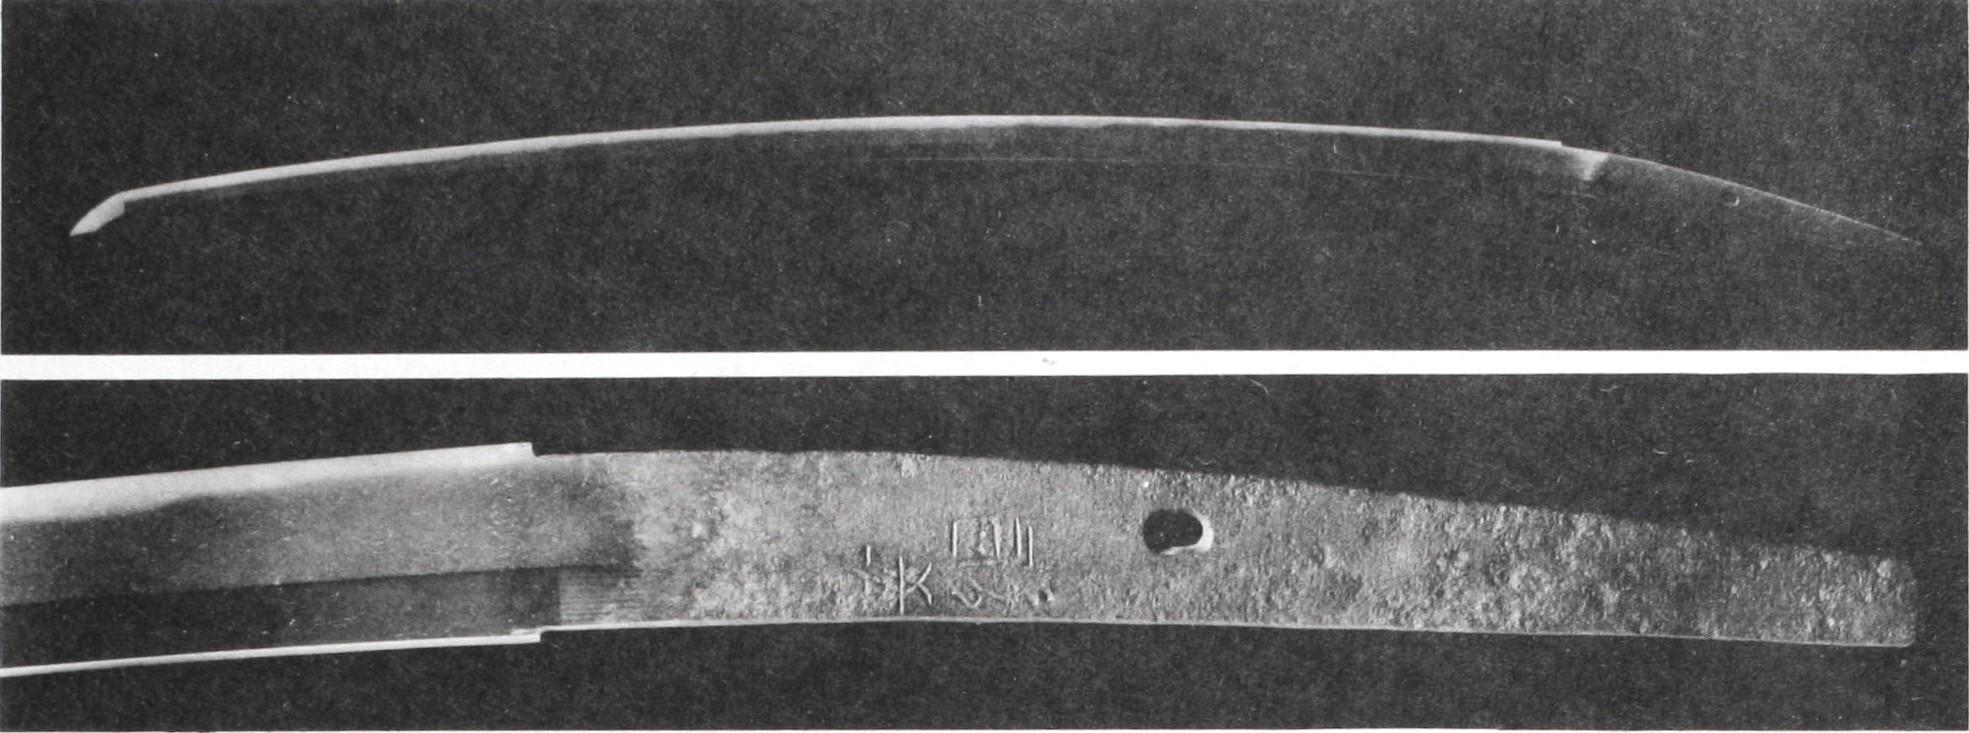 Doji kiri sword